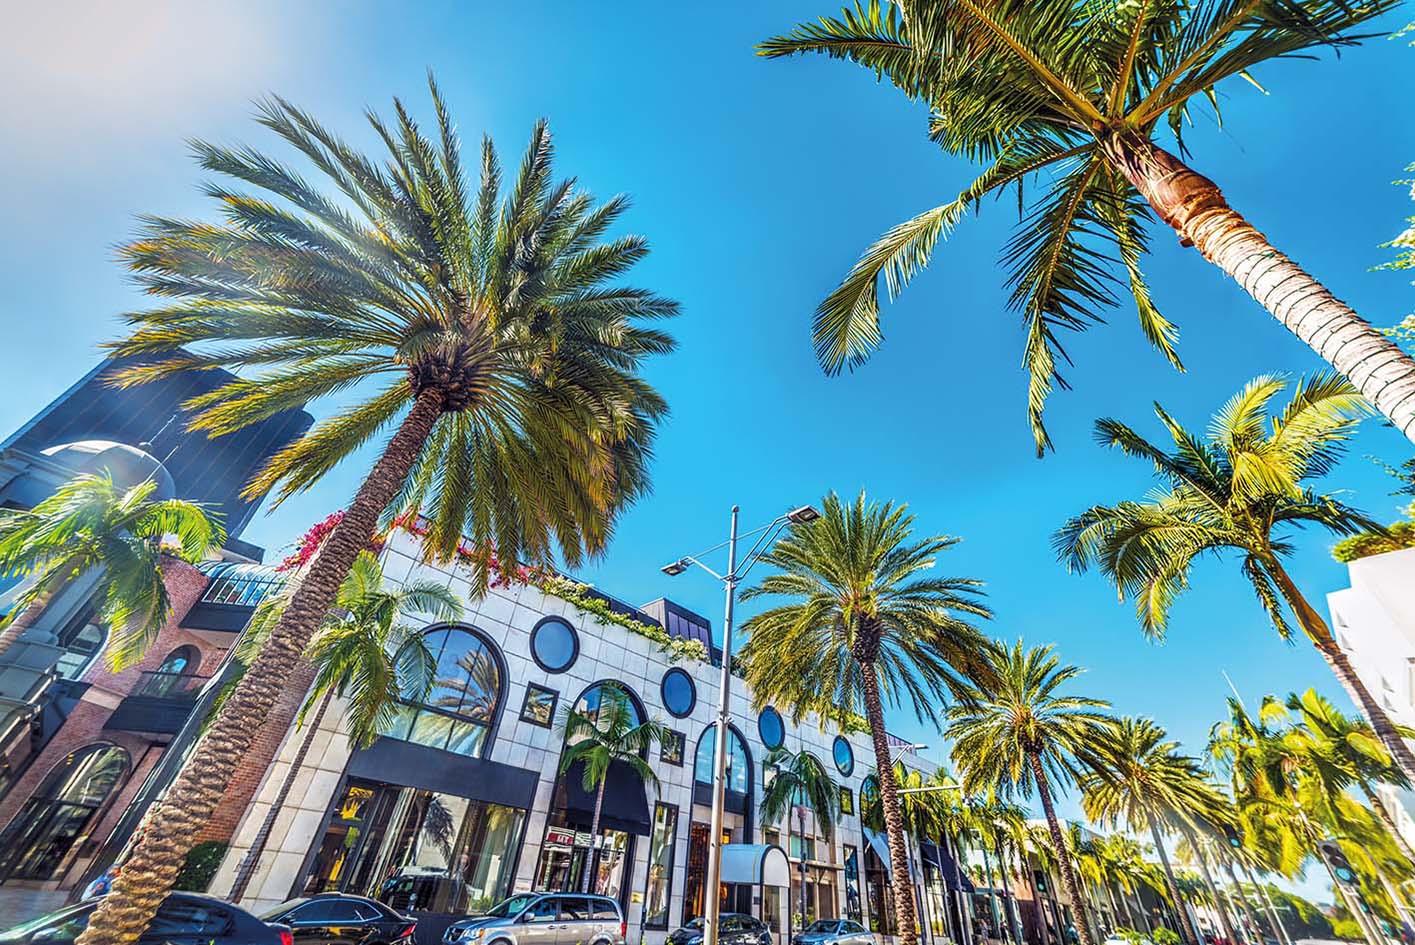 Los Angeles & Las Vegas – University of Redlands